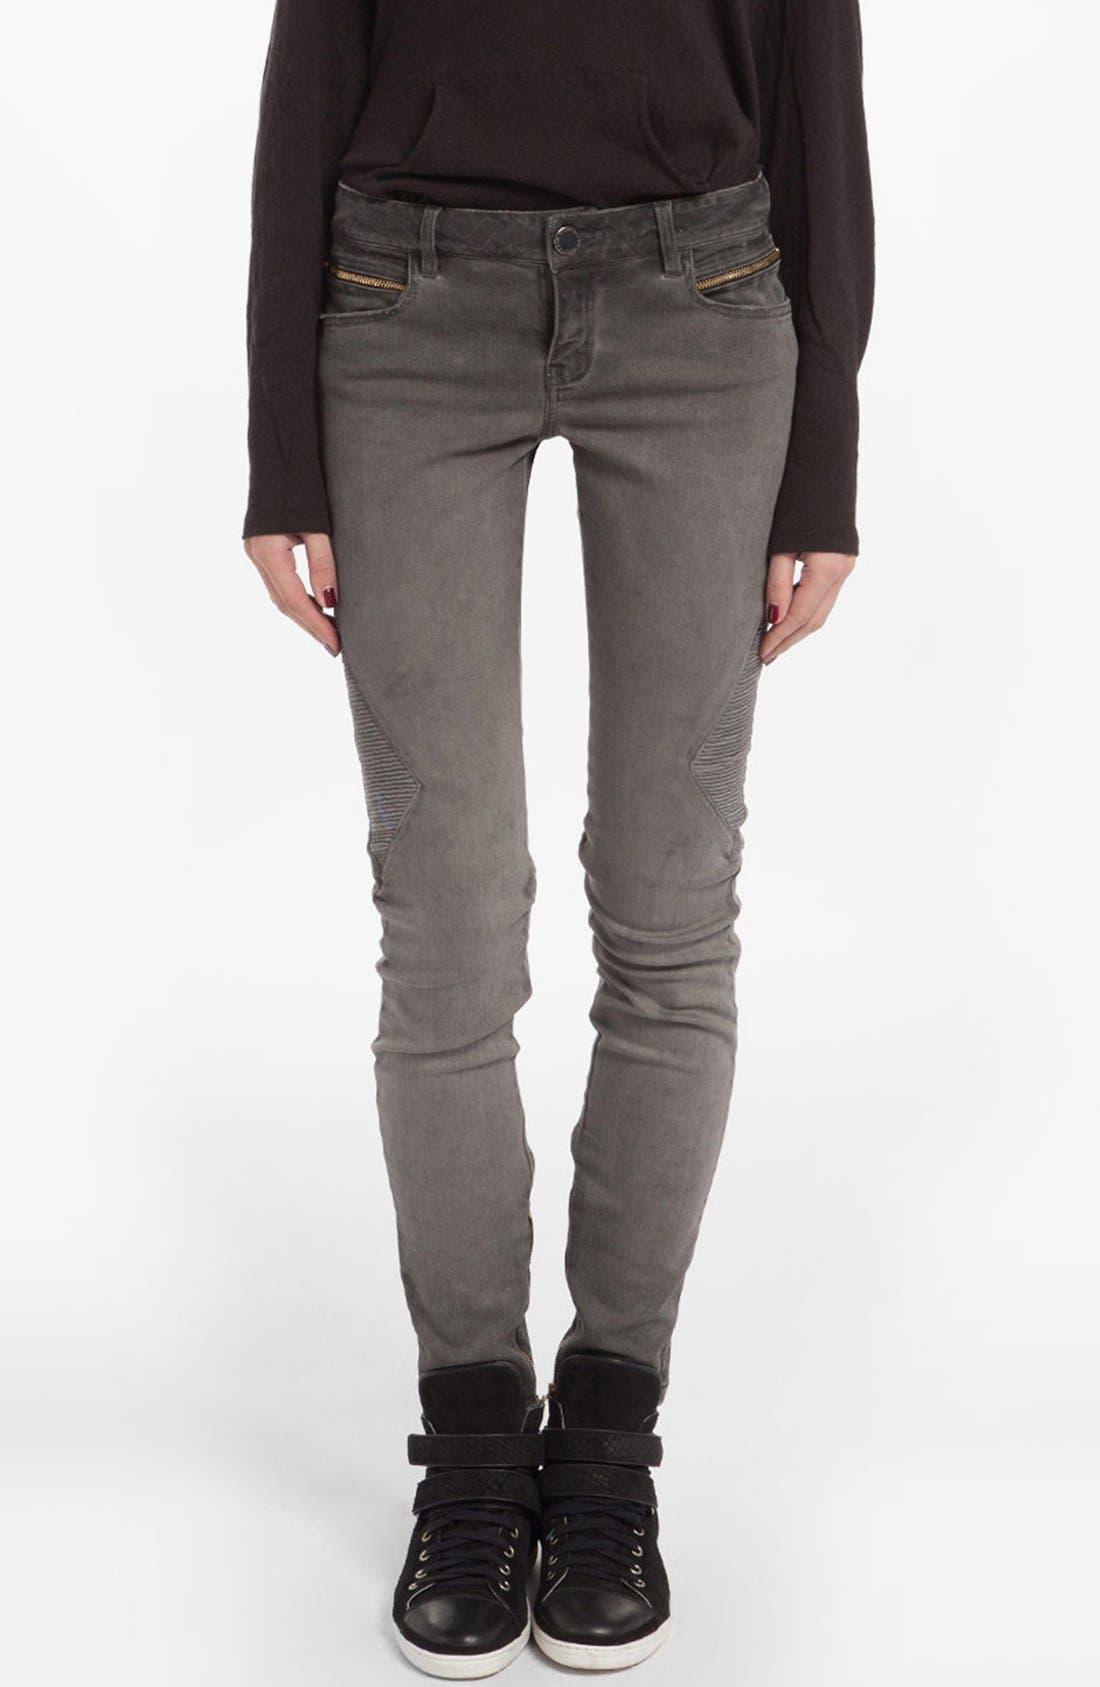 Alternate Image 1 Selected - maje 'Diabolo' Skinny Jeans (Charcoal Grey)